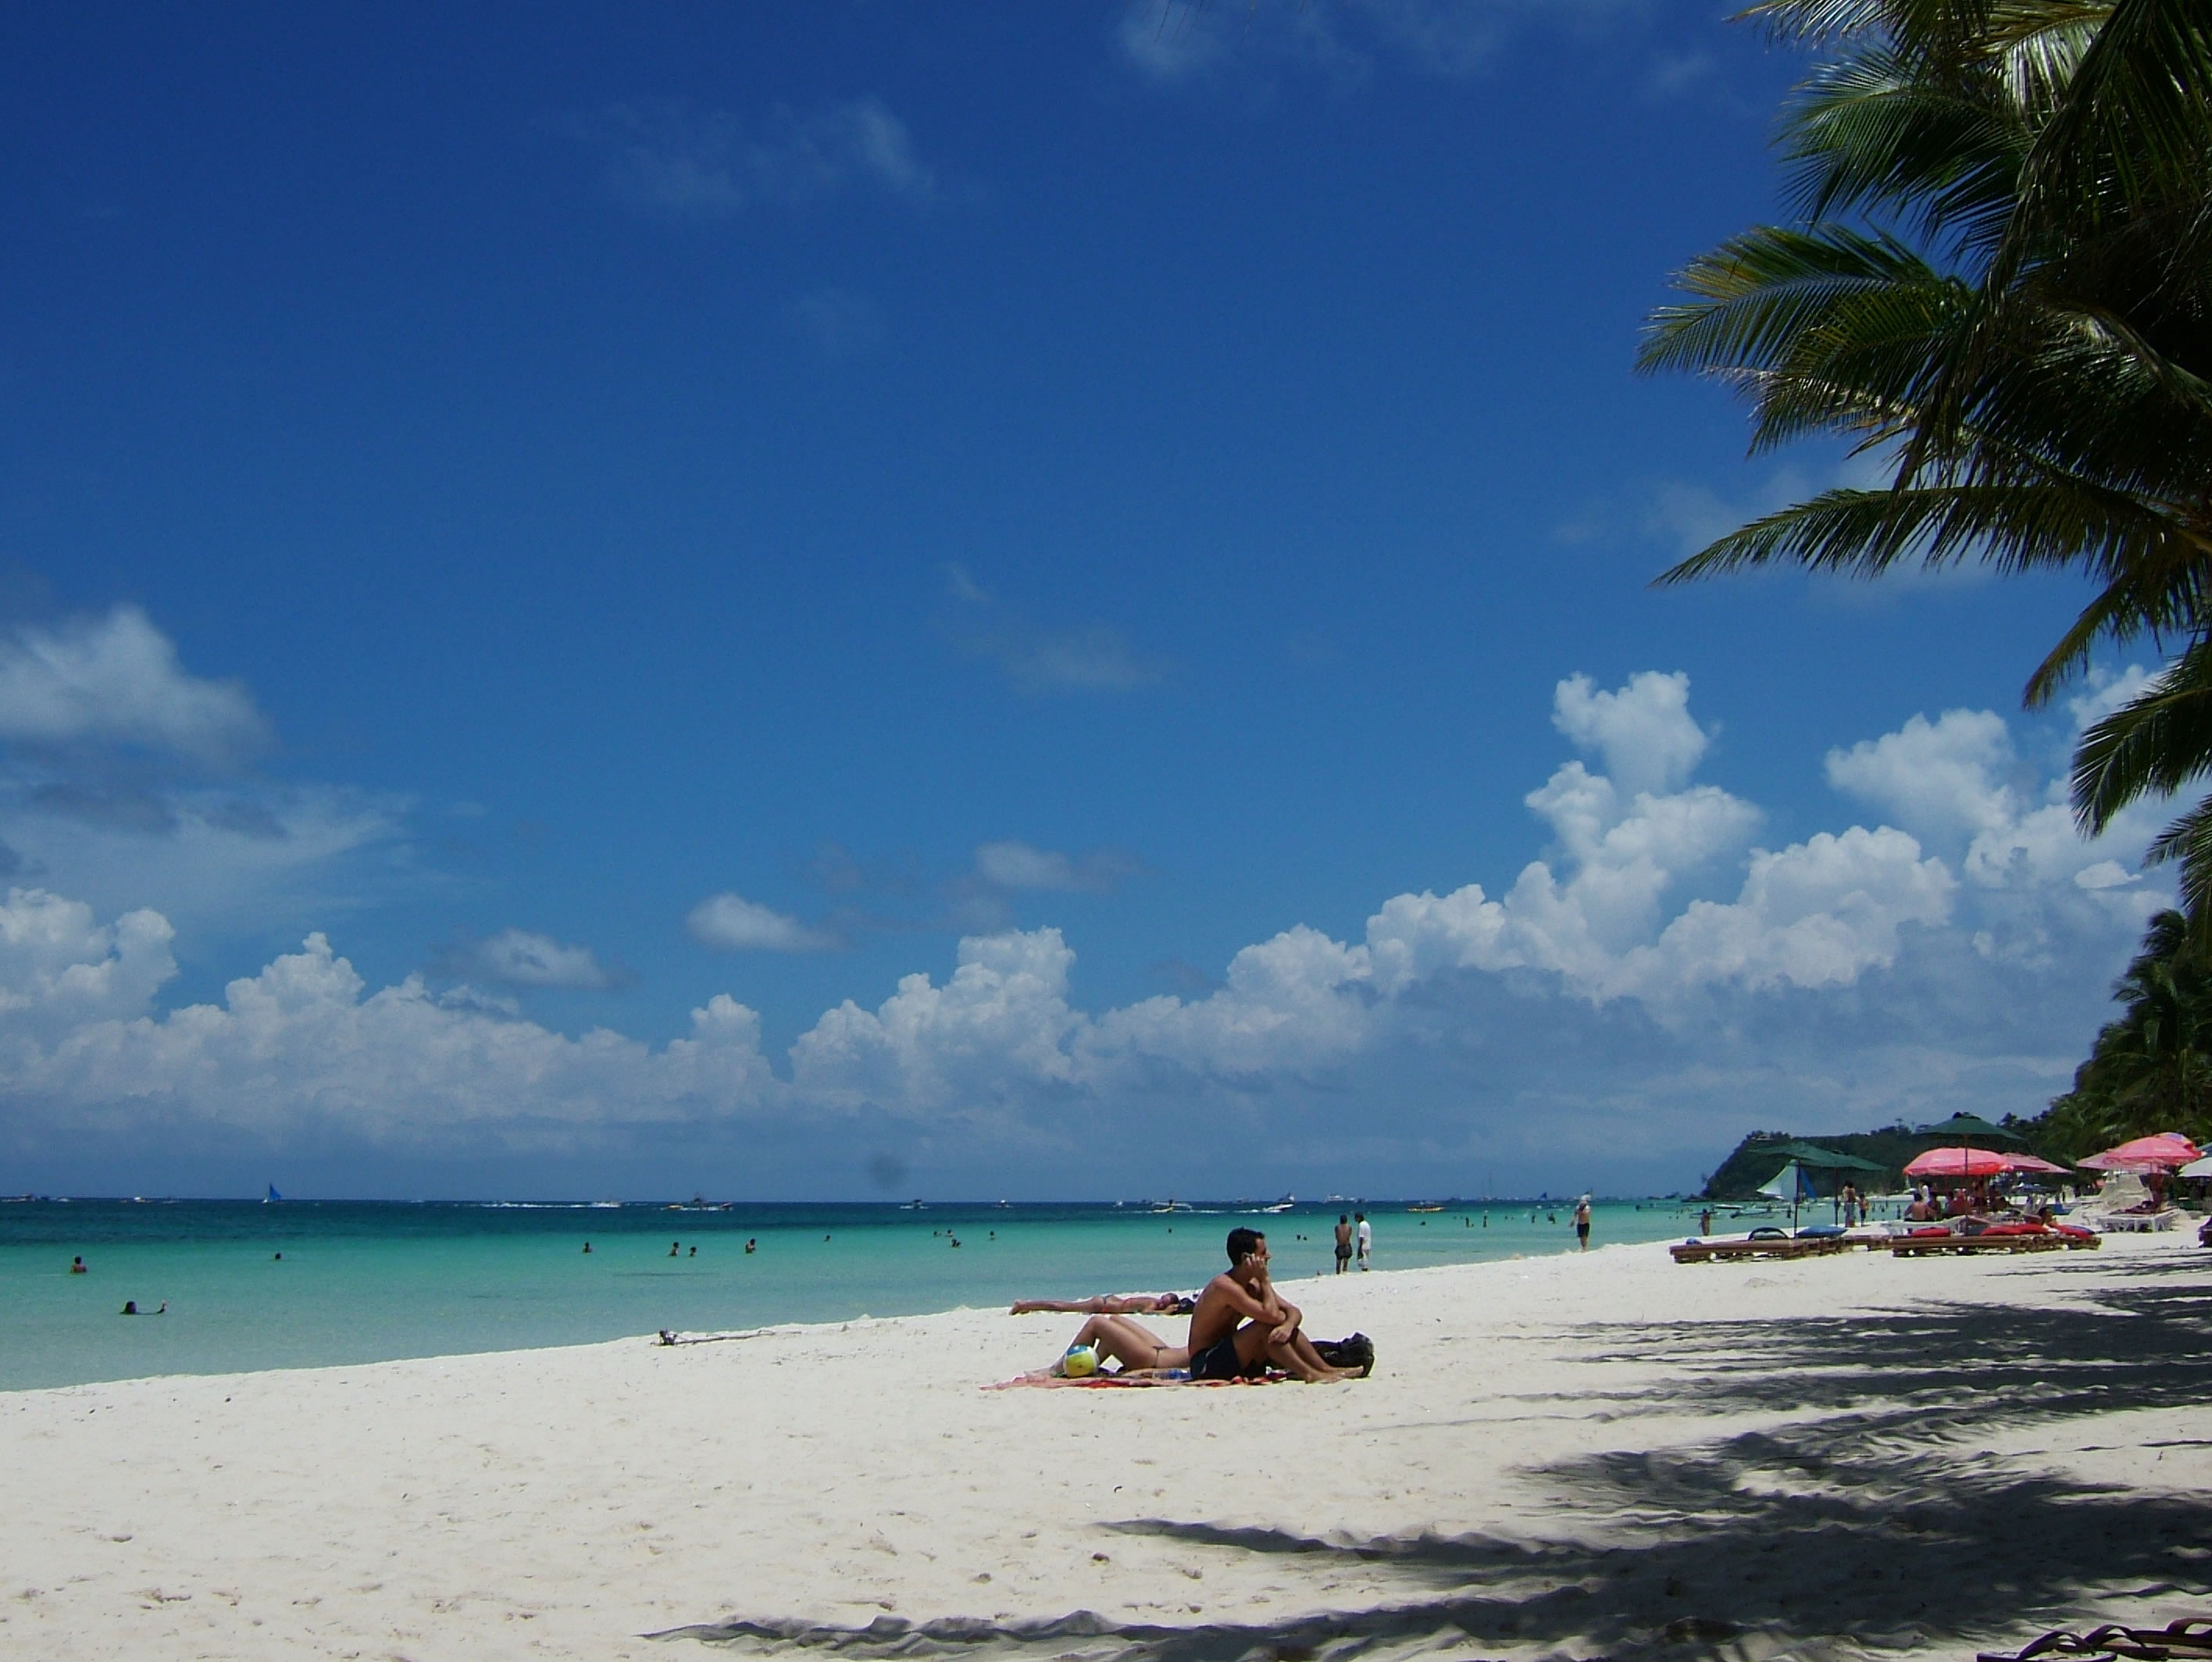 Philippines Sugar Islands Boracay Punta bunga beach Resorts 2007 01